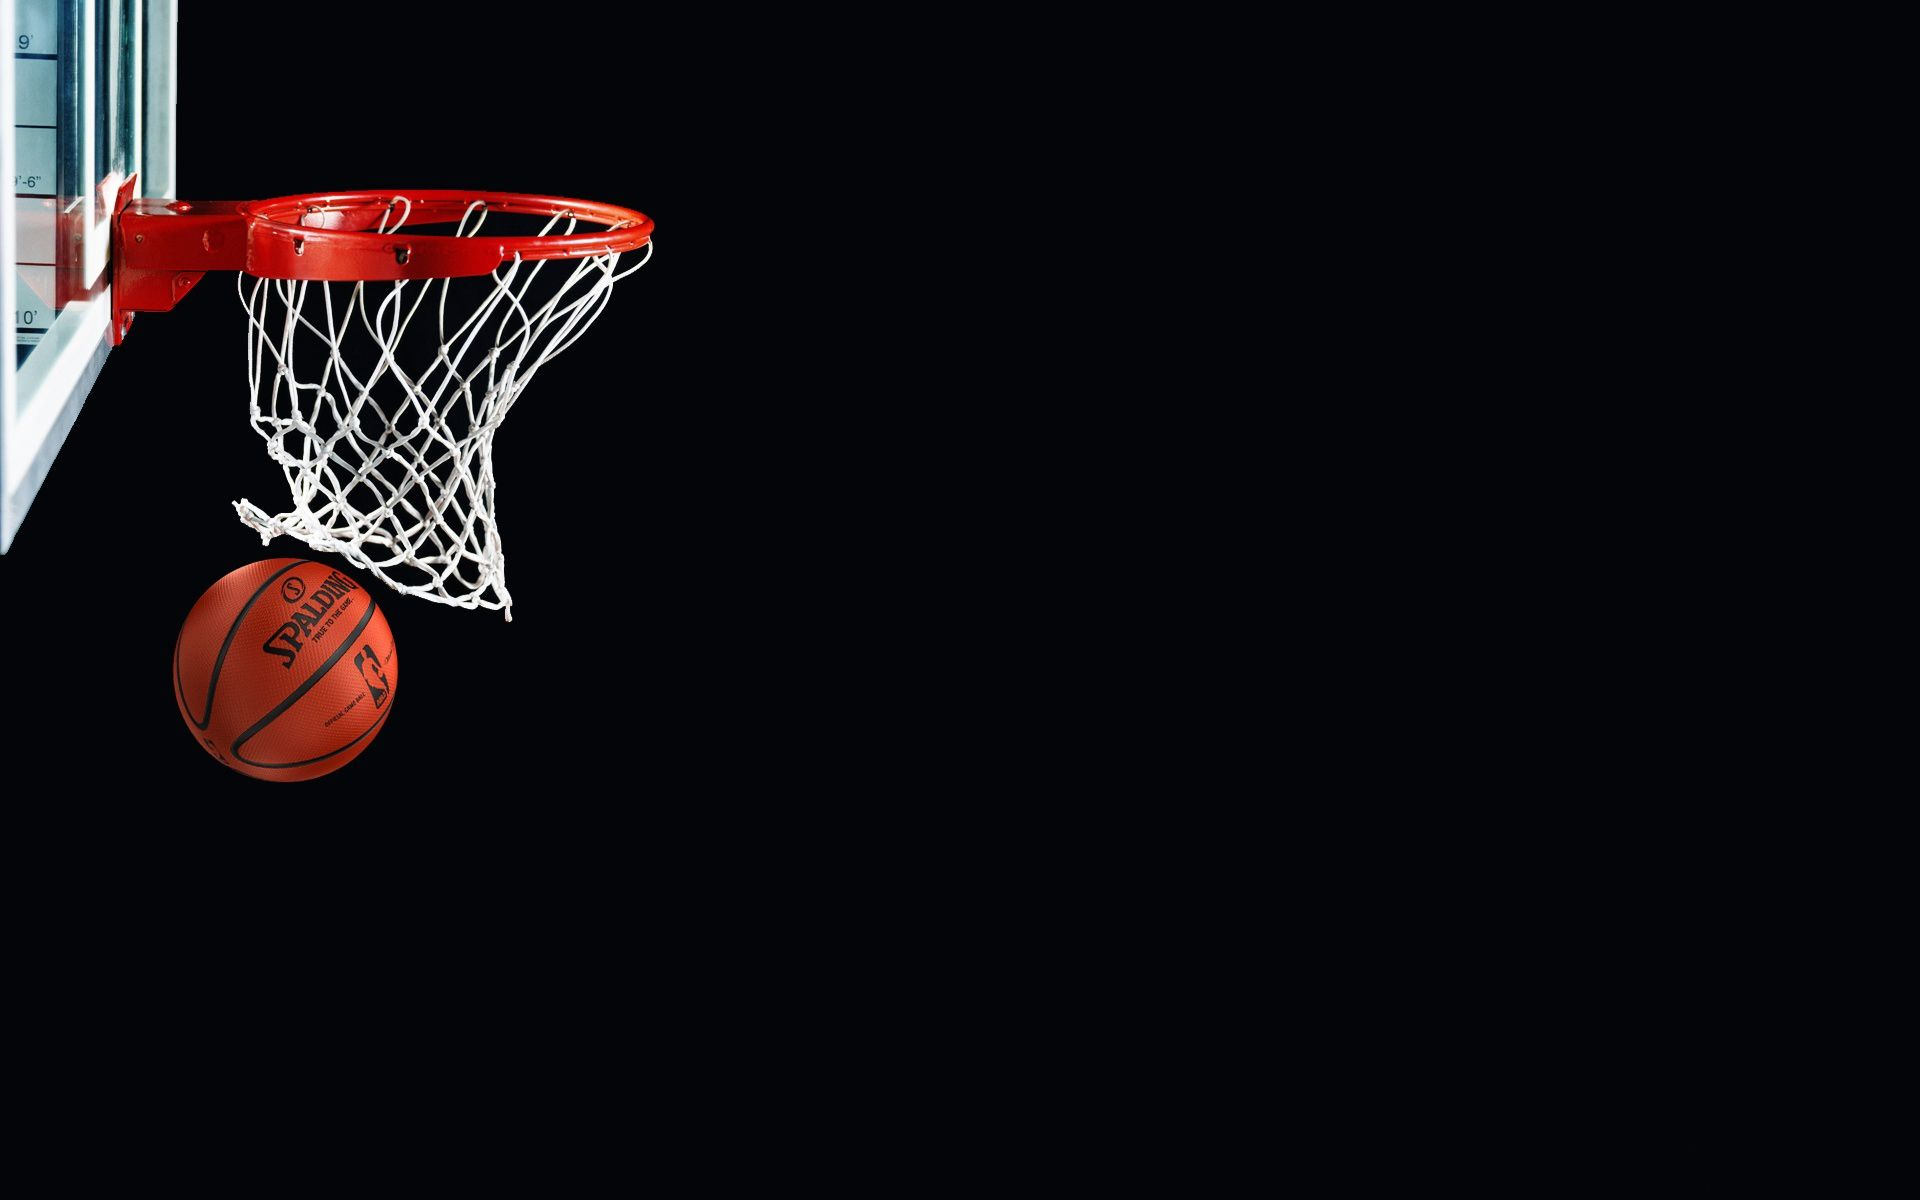 Basketball Backgrounds Wallpaper Abyss Everything Basketball Sports Basketball 344223 Aro De Baloncesto Tablero De Baloncesto Baloncesto